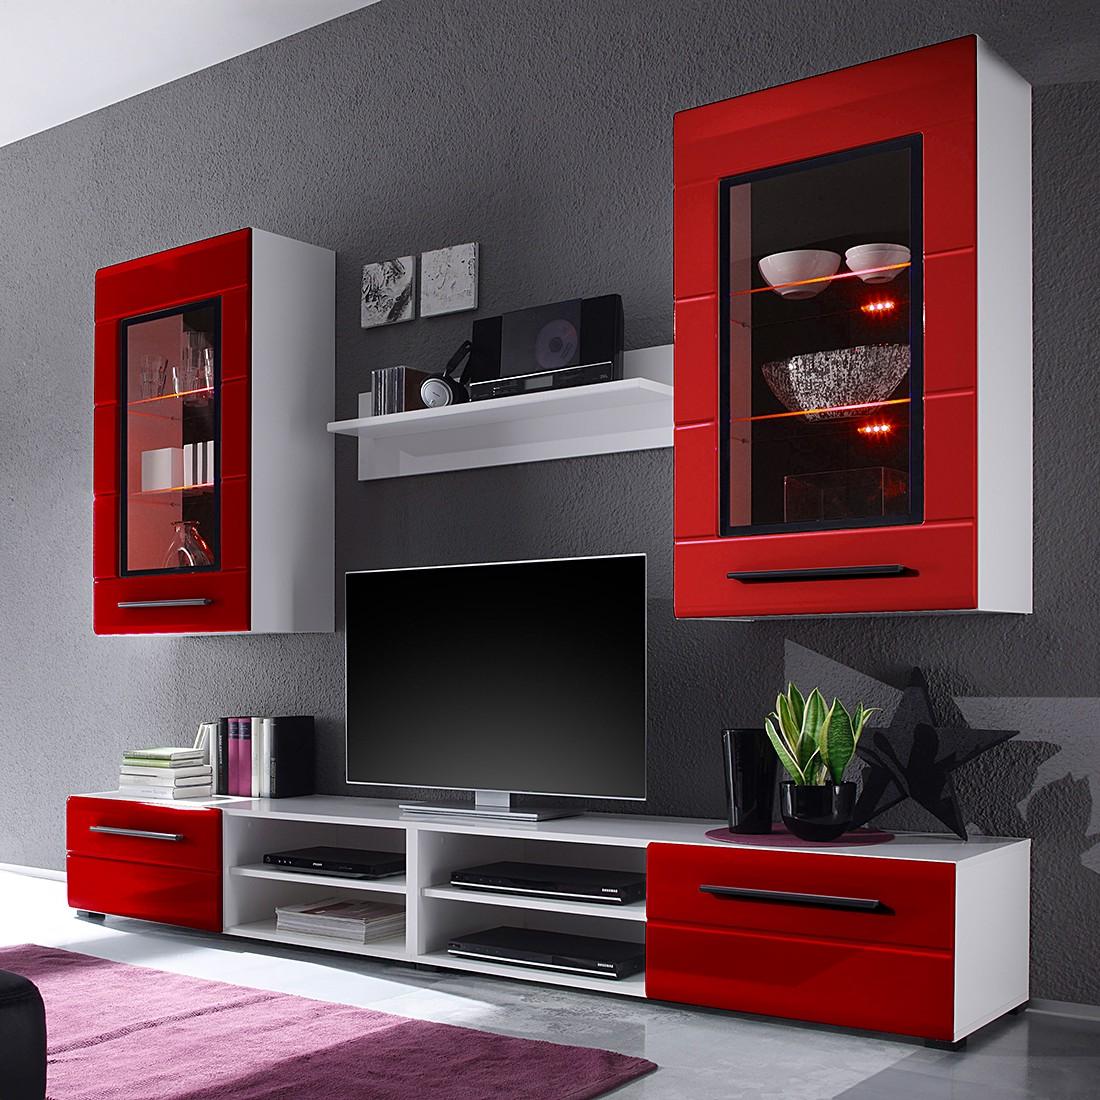 Meuble tv meuble tv 240 meuble tv 240 trouvez meuble tv for Wohnwand 70 euro